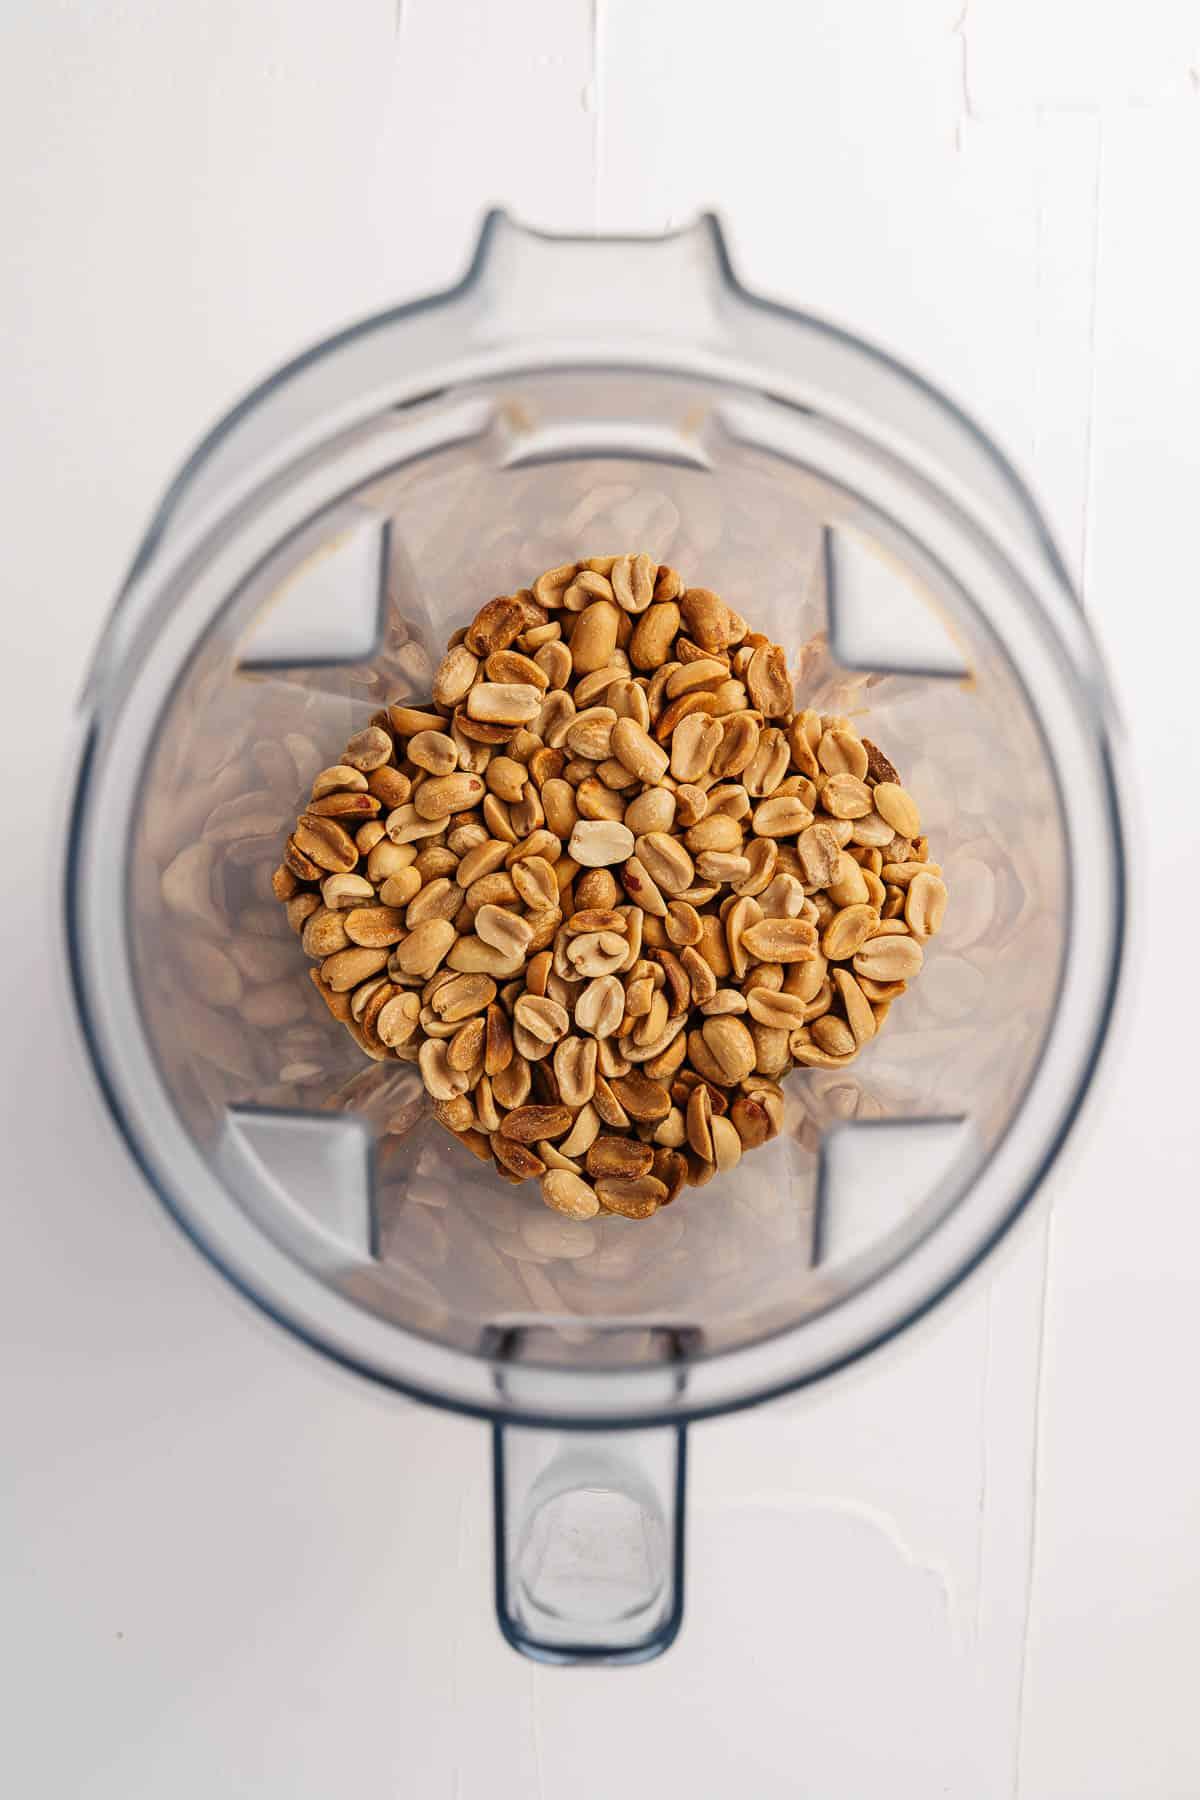 Peanuts in a Blender